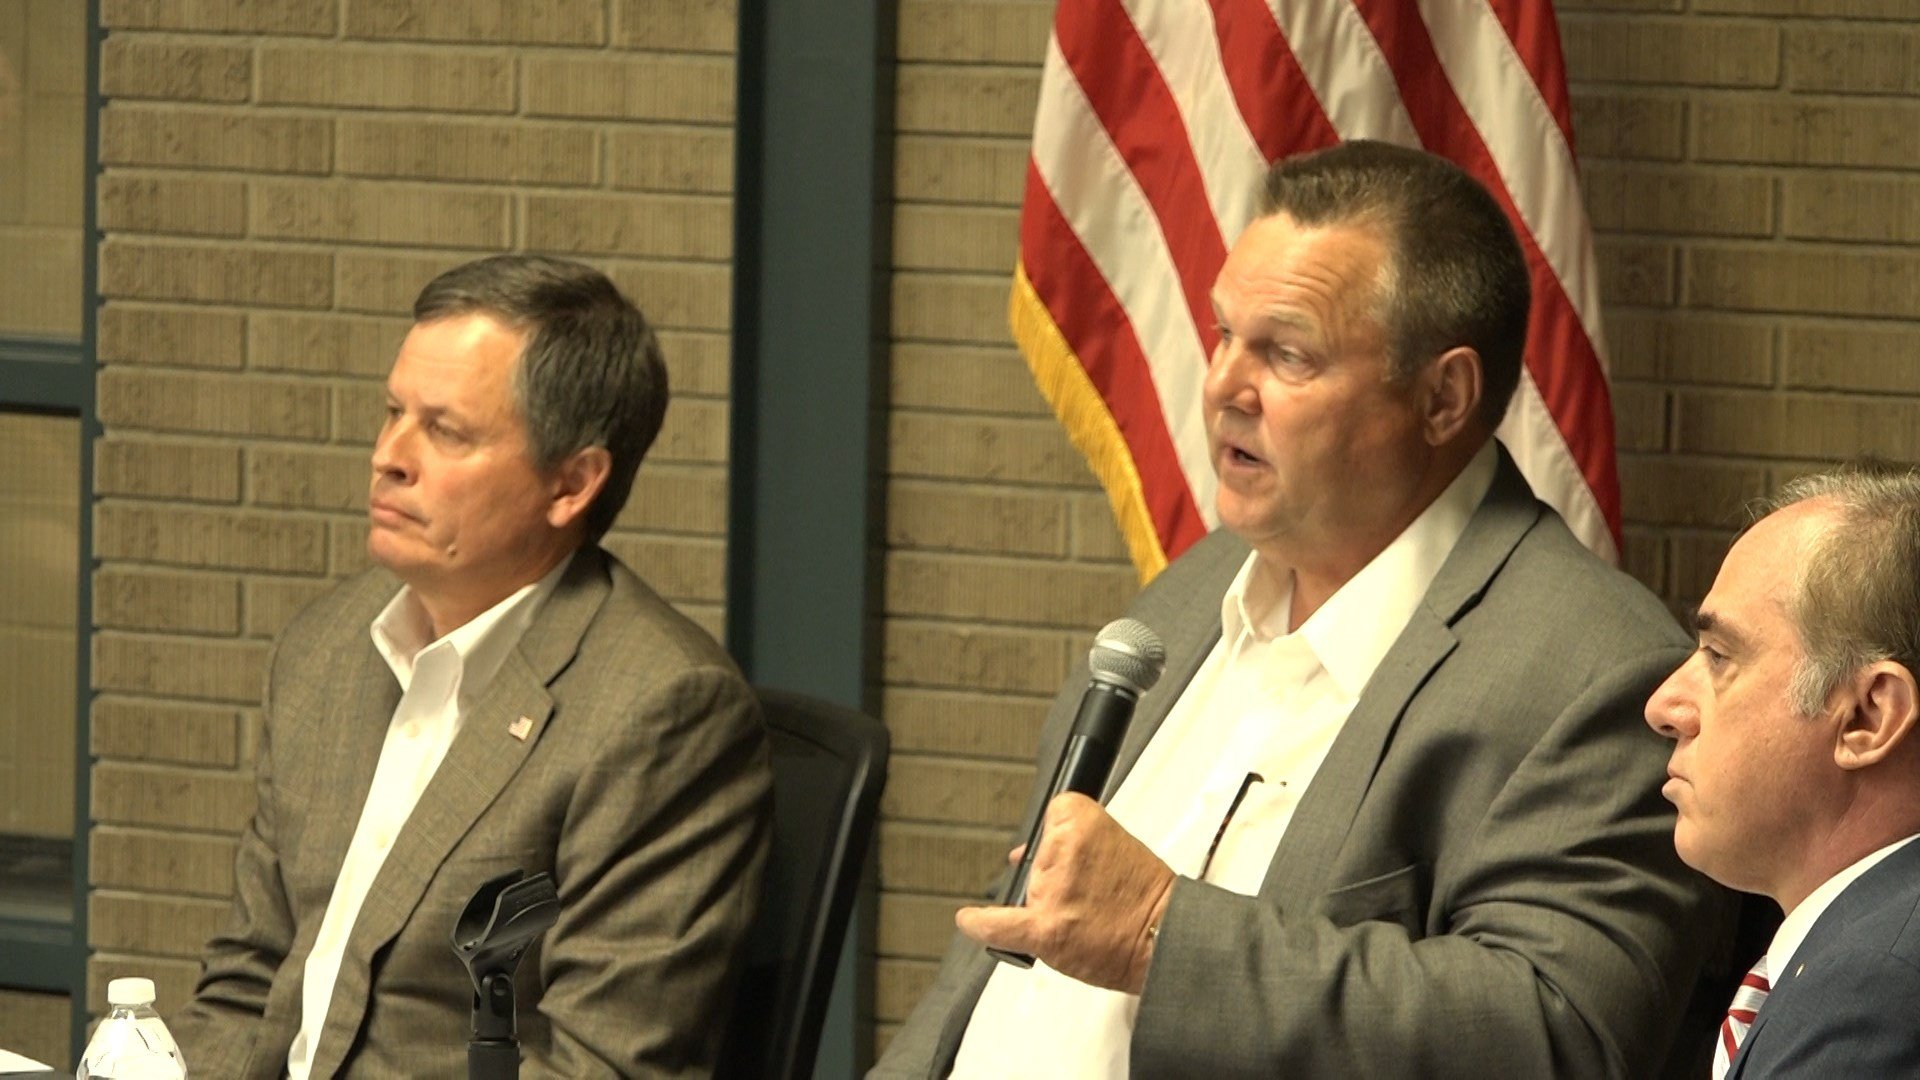 U.S. VA Secretary David Shulkin (right) at a public forum in Helena with Sens. Daines and Tester (center)